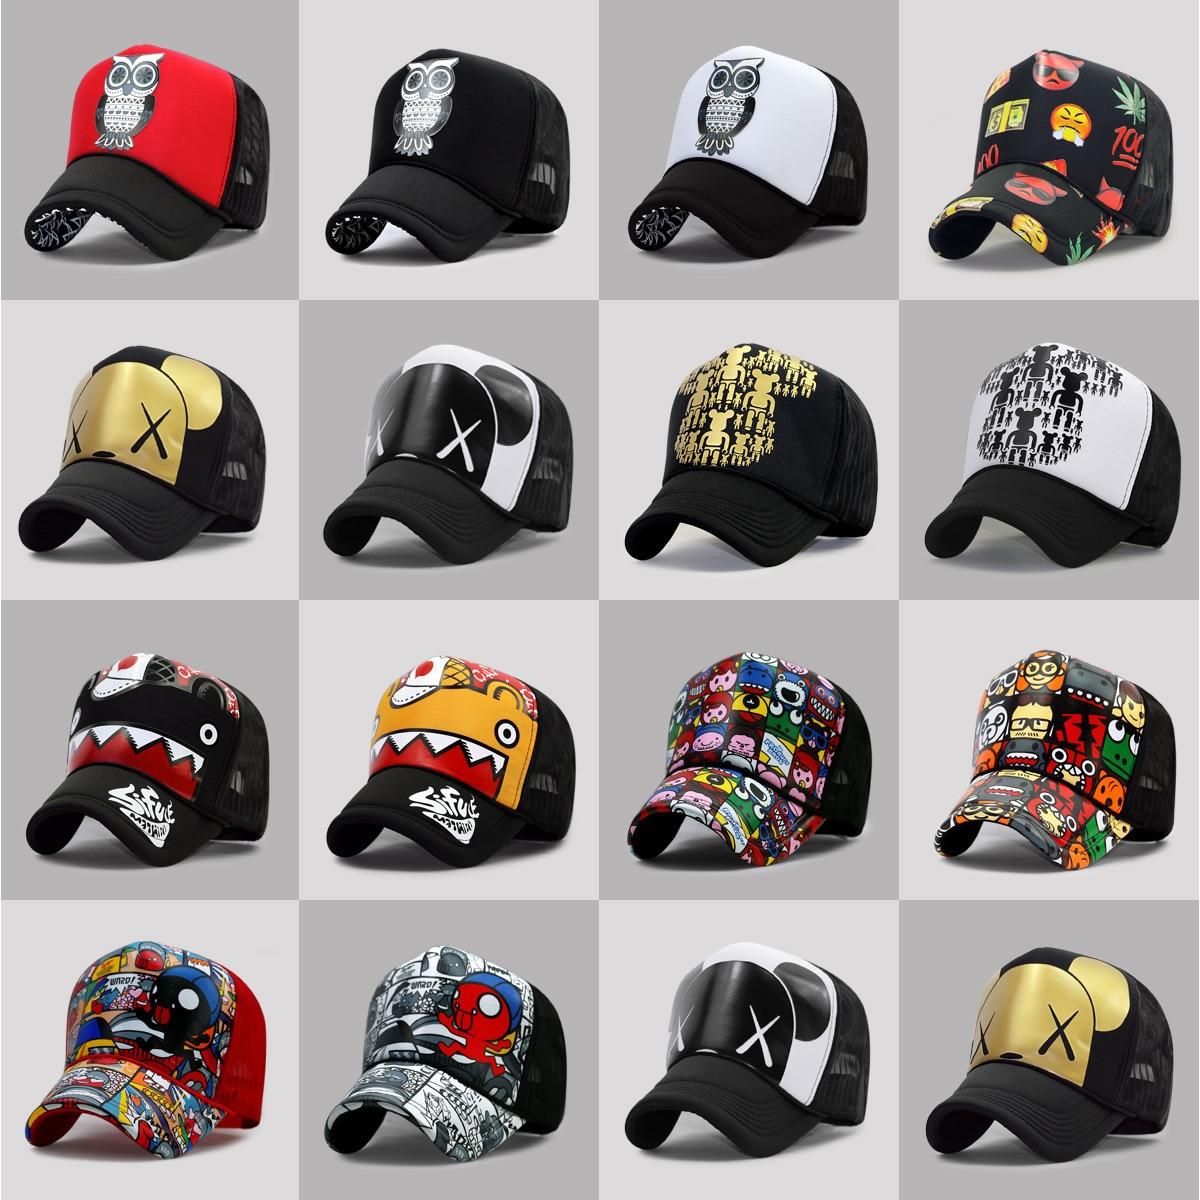 03ab9512b2600 Wholesale Adult Summer Sun Hats Men Cool Hiphop Punk Rock Truck Cap Women  Fashion Mesh Baseball